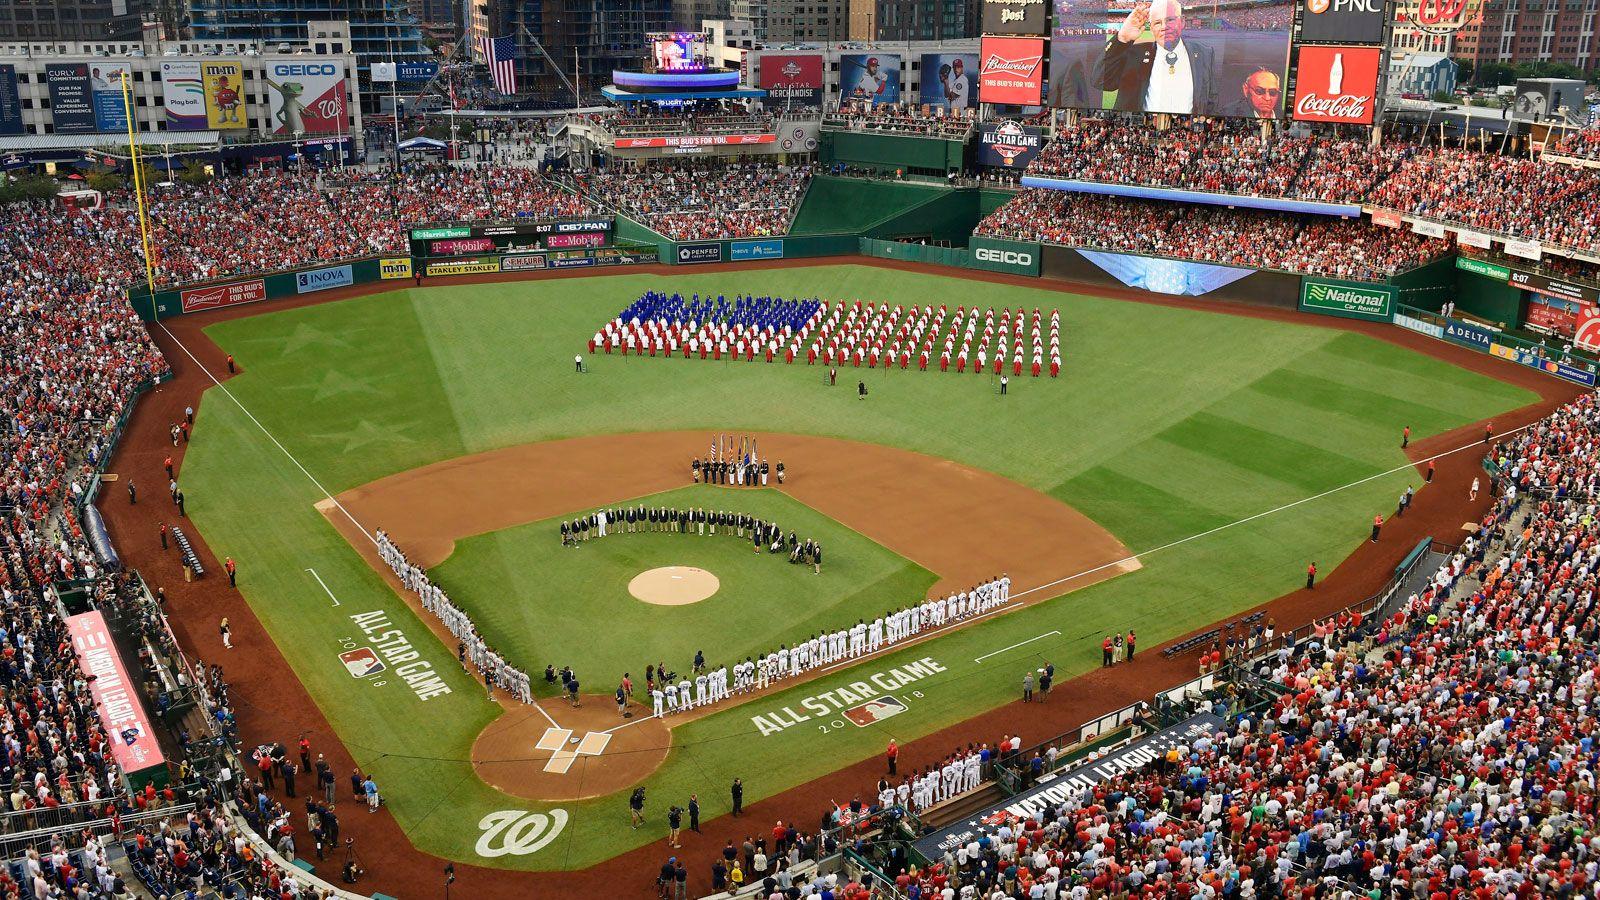 Fox Regional Sports Network sale nears conclusion as final